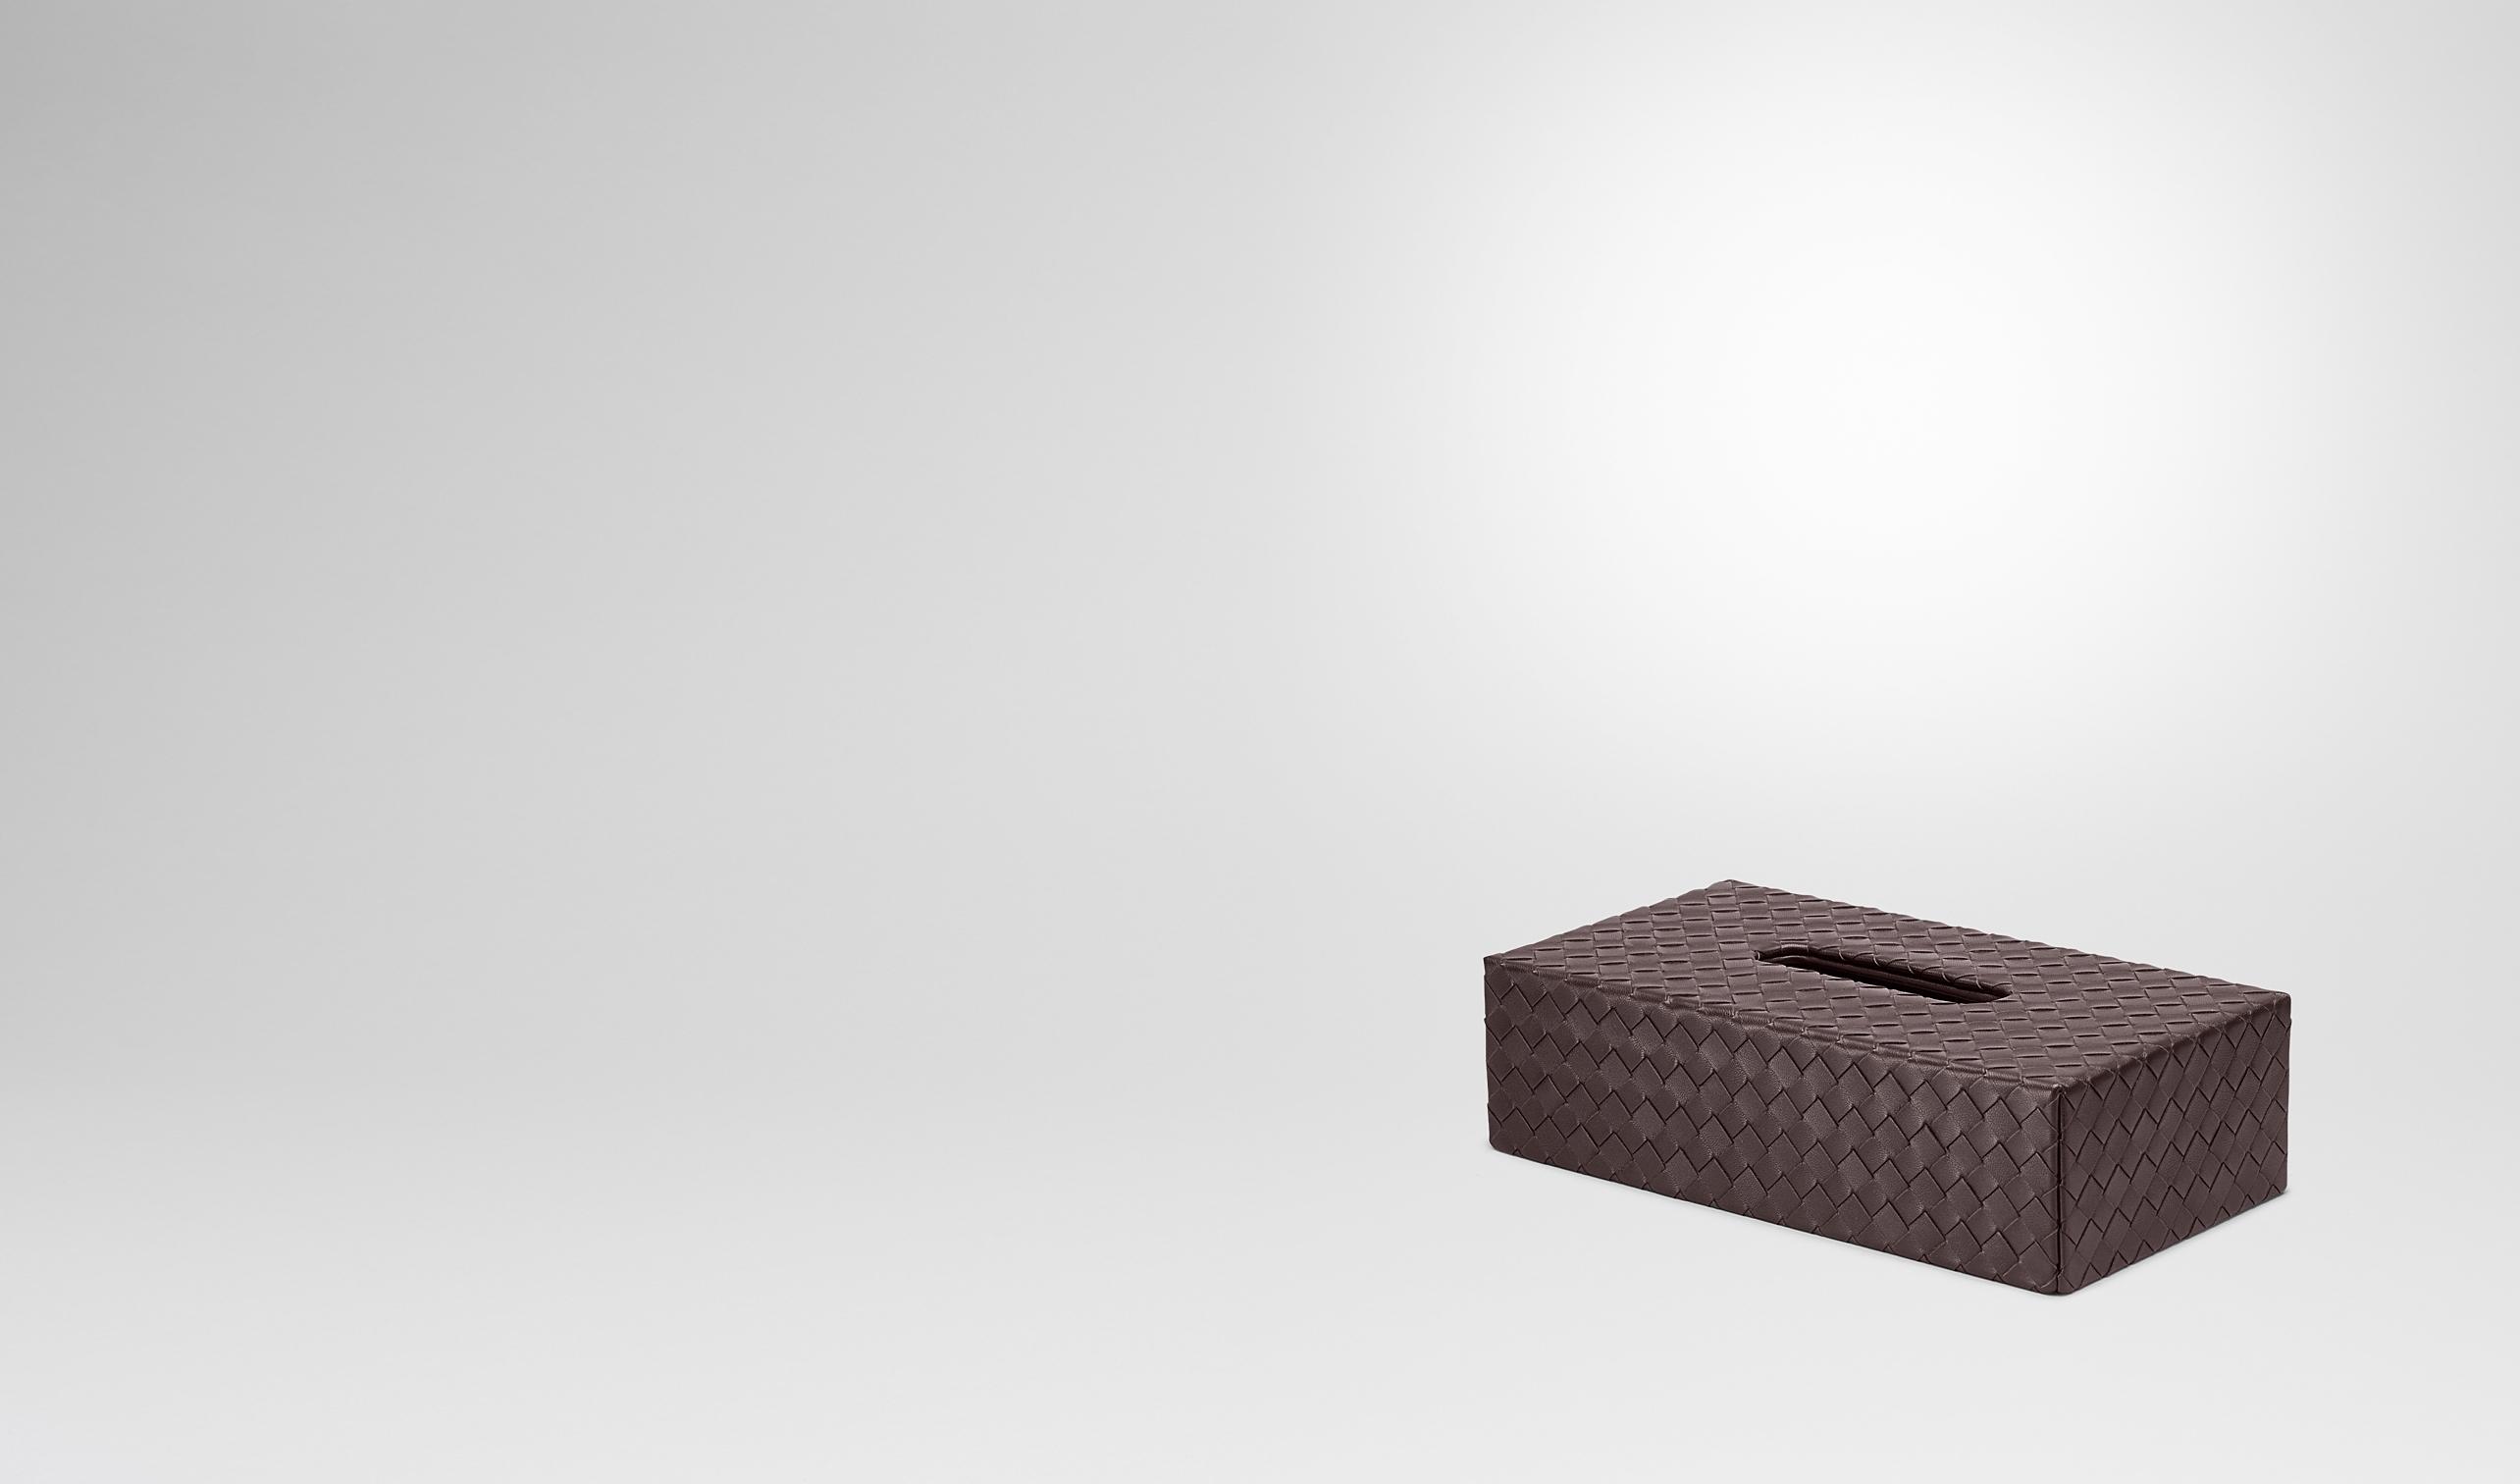 BOTTEGA VENETA Schreibtisch Accessoire E Horizontale Taschentuch-Box aus Nappaleder Intrecciato Ebano pl